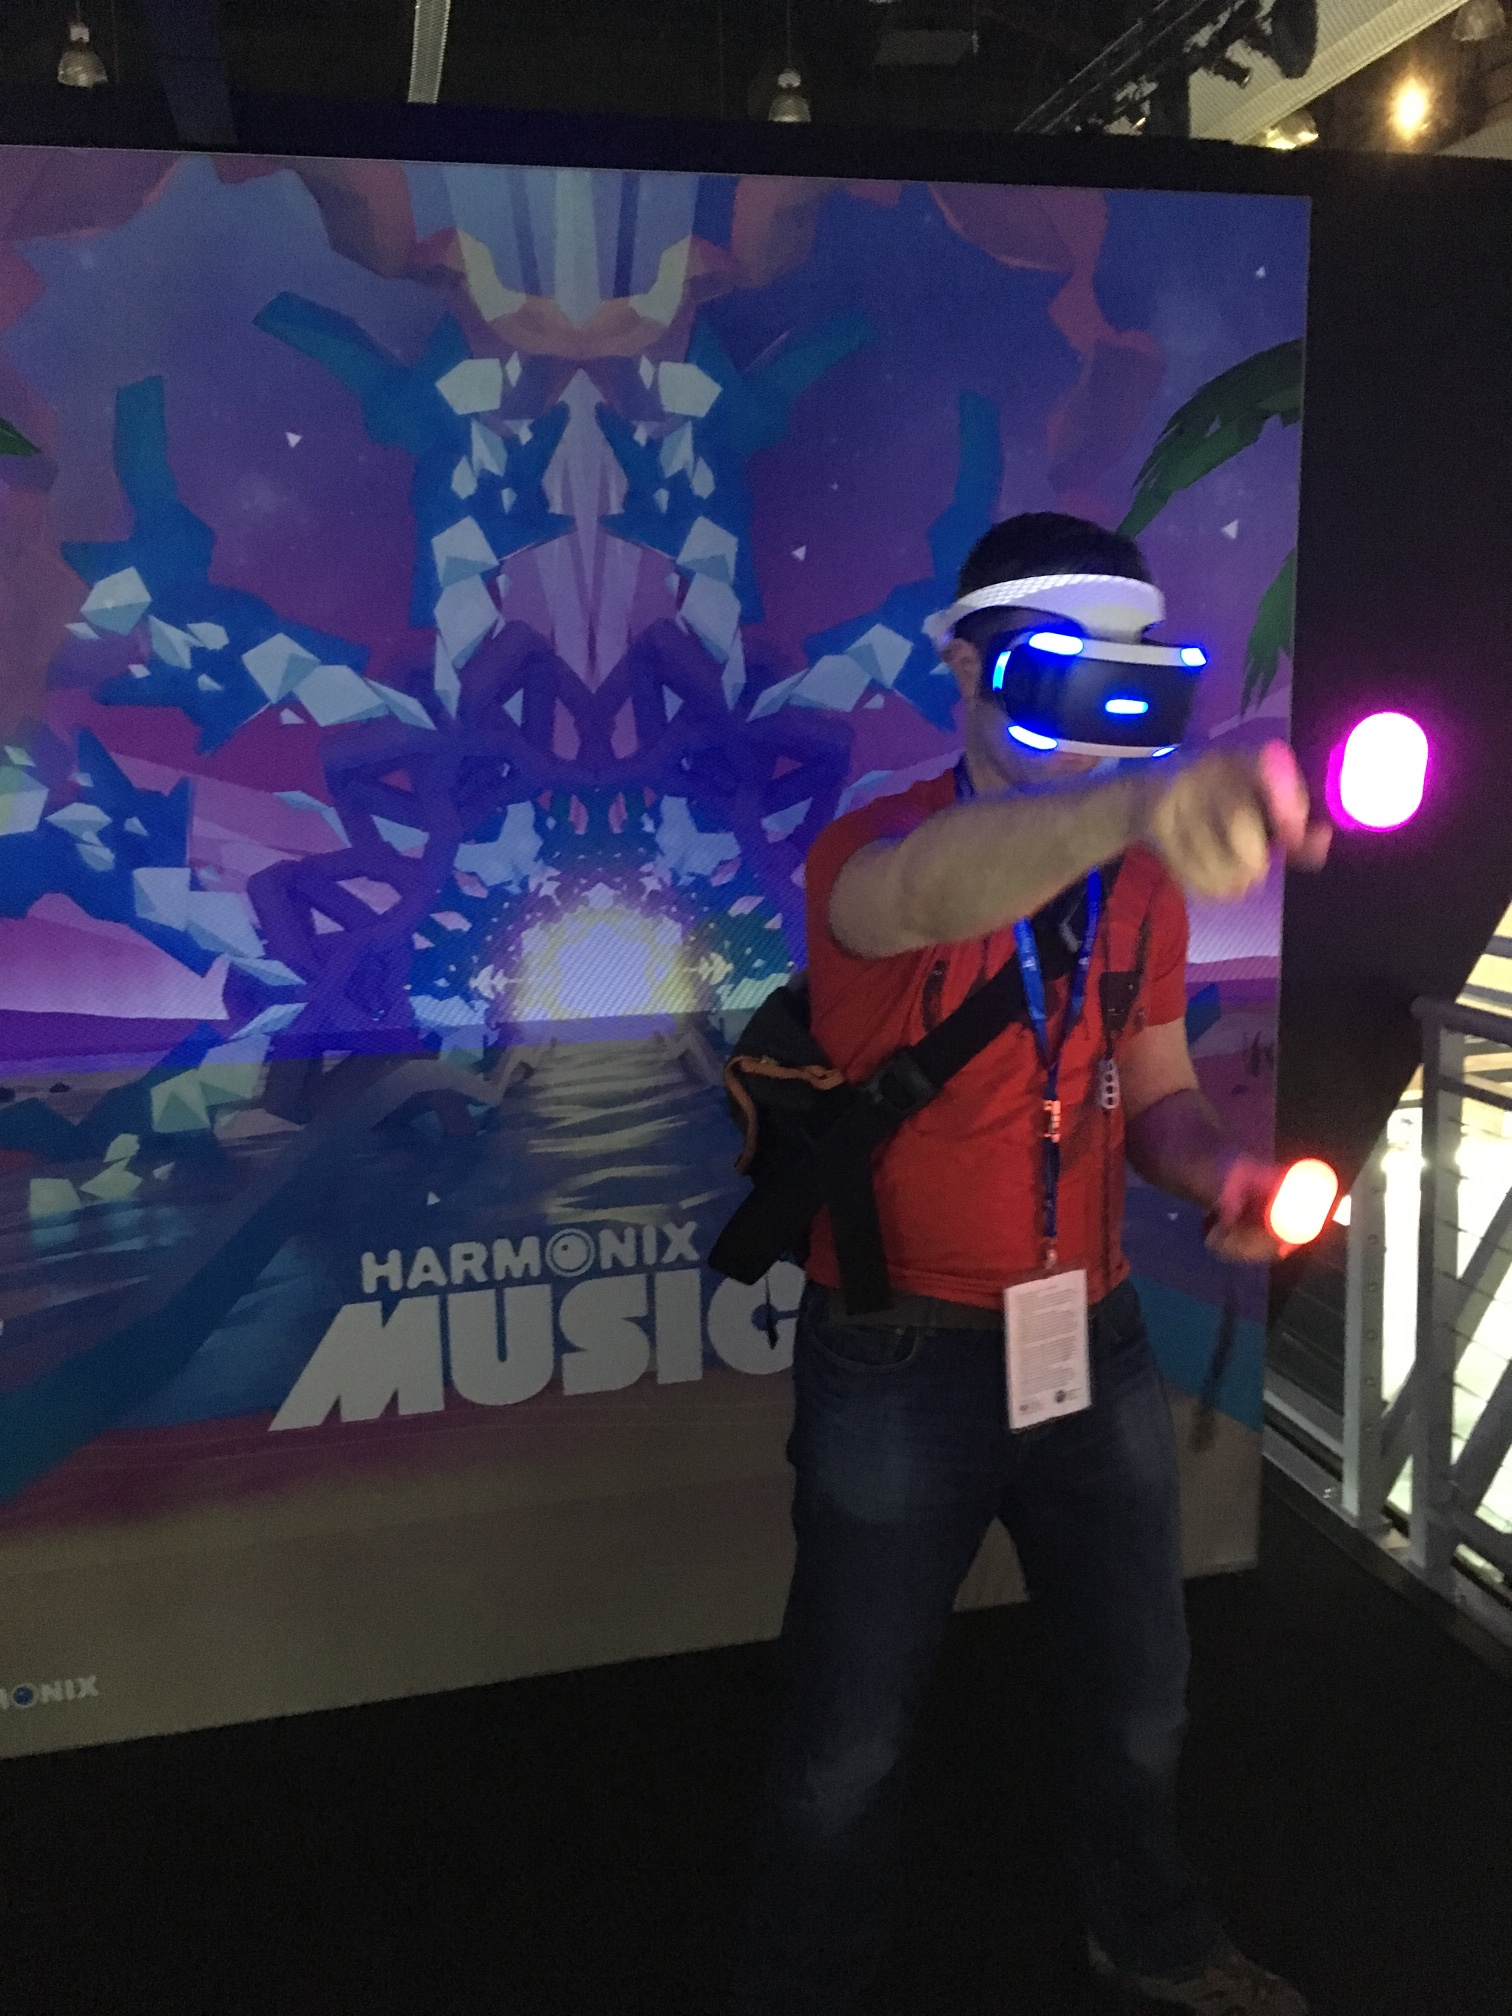 Chris testing out Harmonix Music VR!